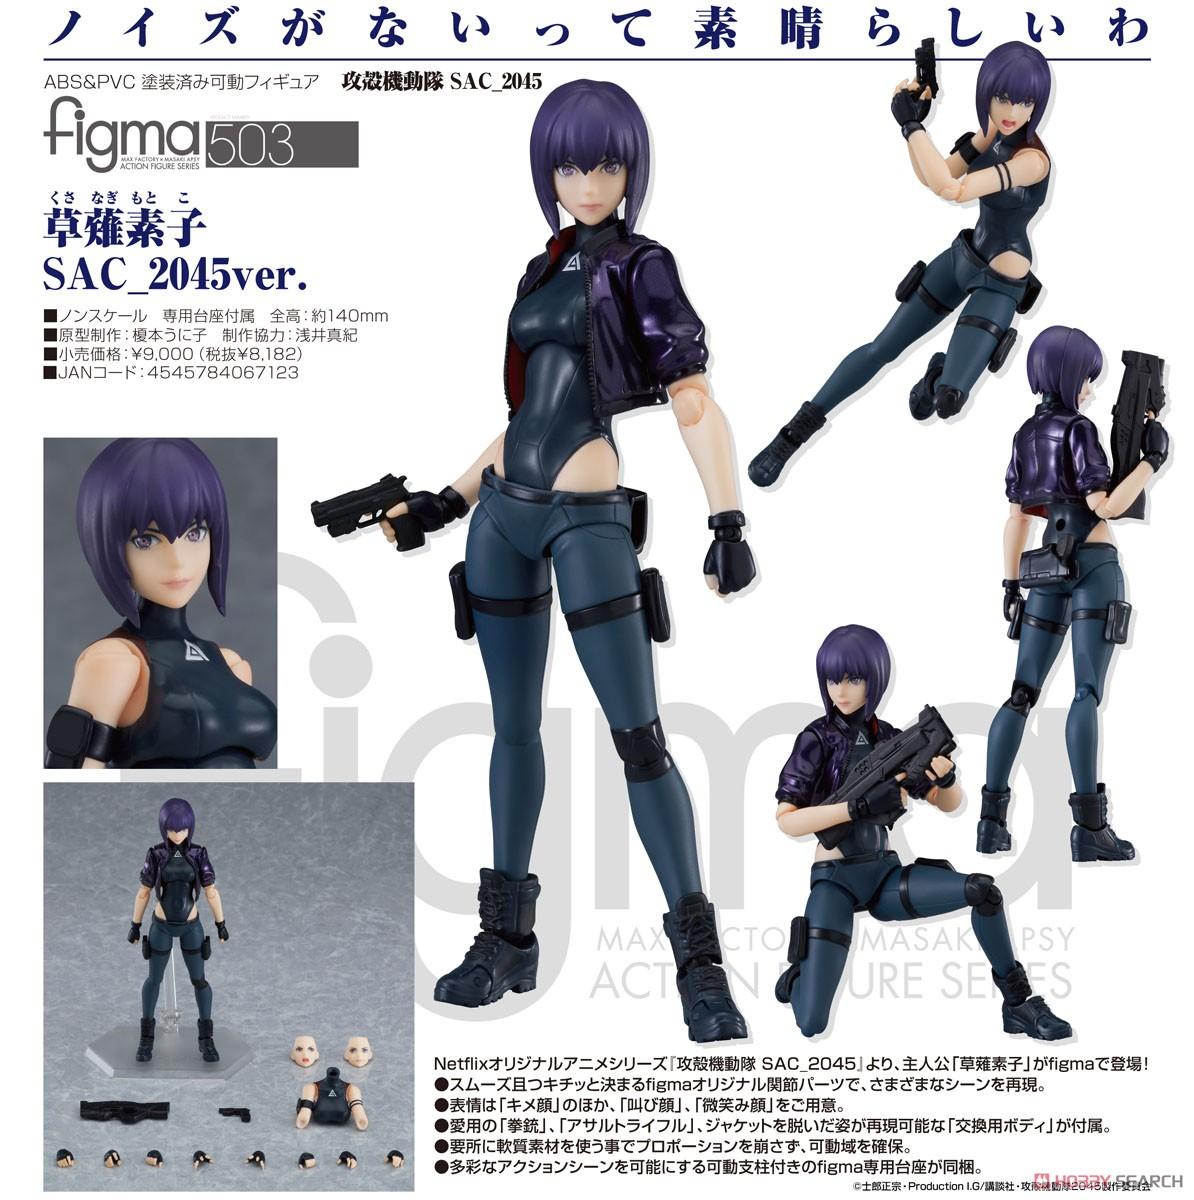 figma『草薙素子 SAC_2045ver.』攻殻機動隊 SAC_2045 可動フィギュア-007